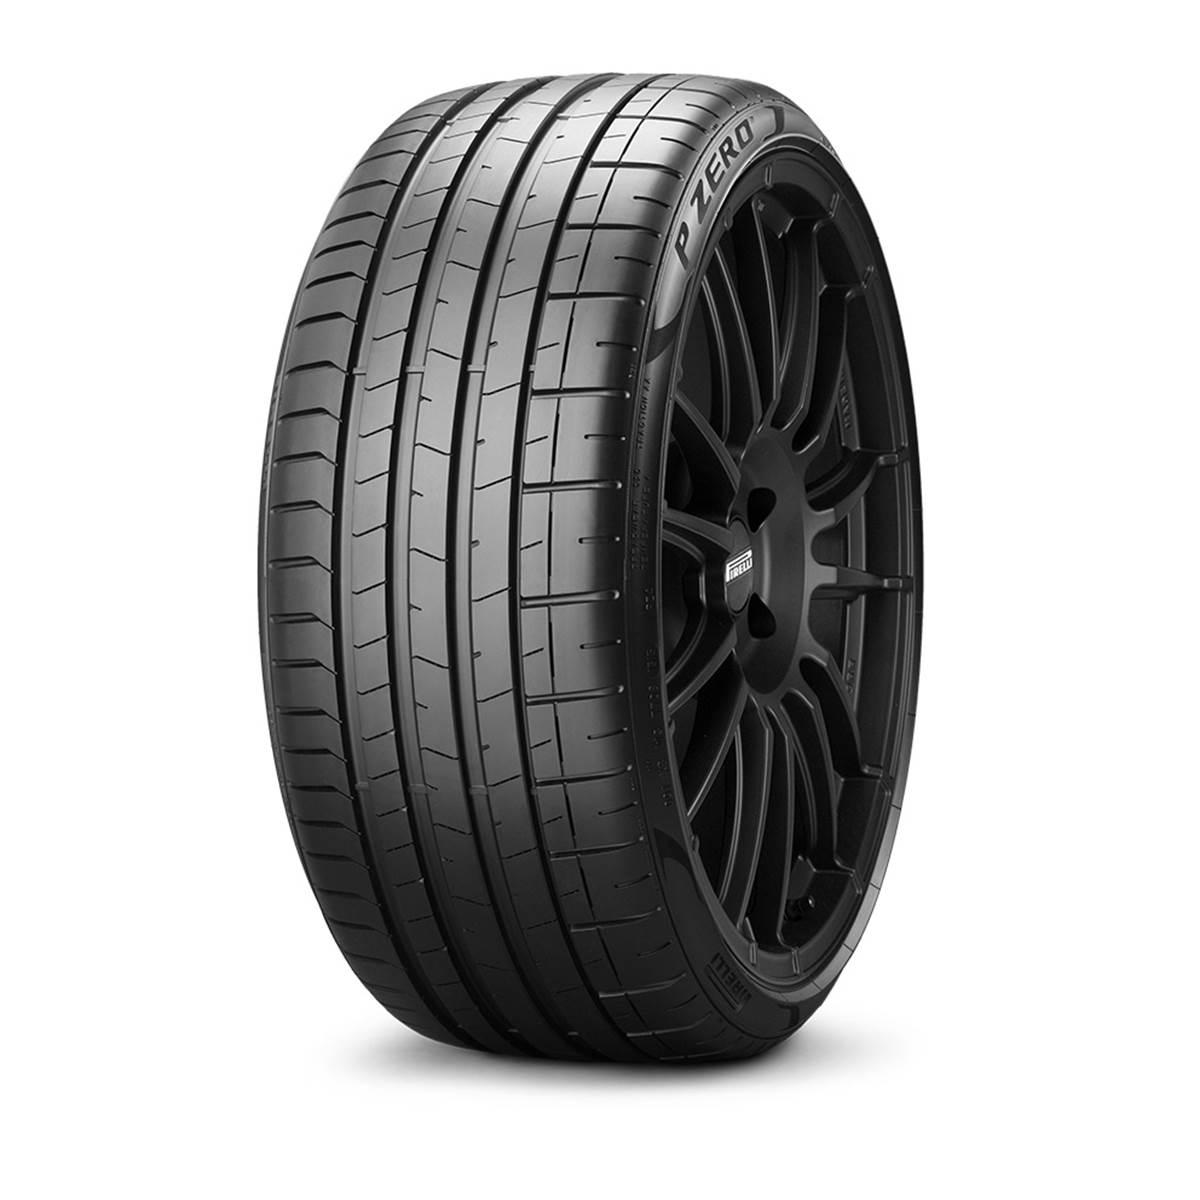 Pneu Pirelli 235/45R18 98Y P-Zero XL